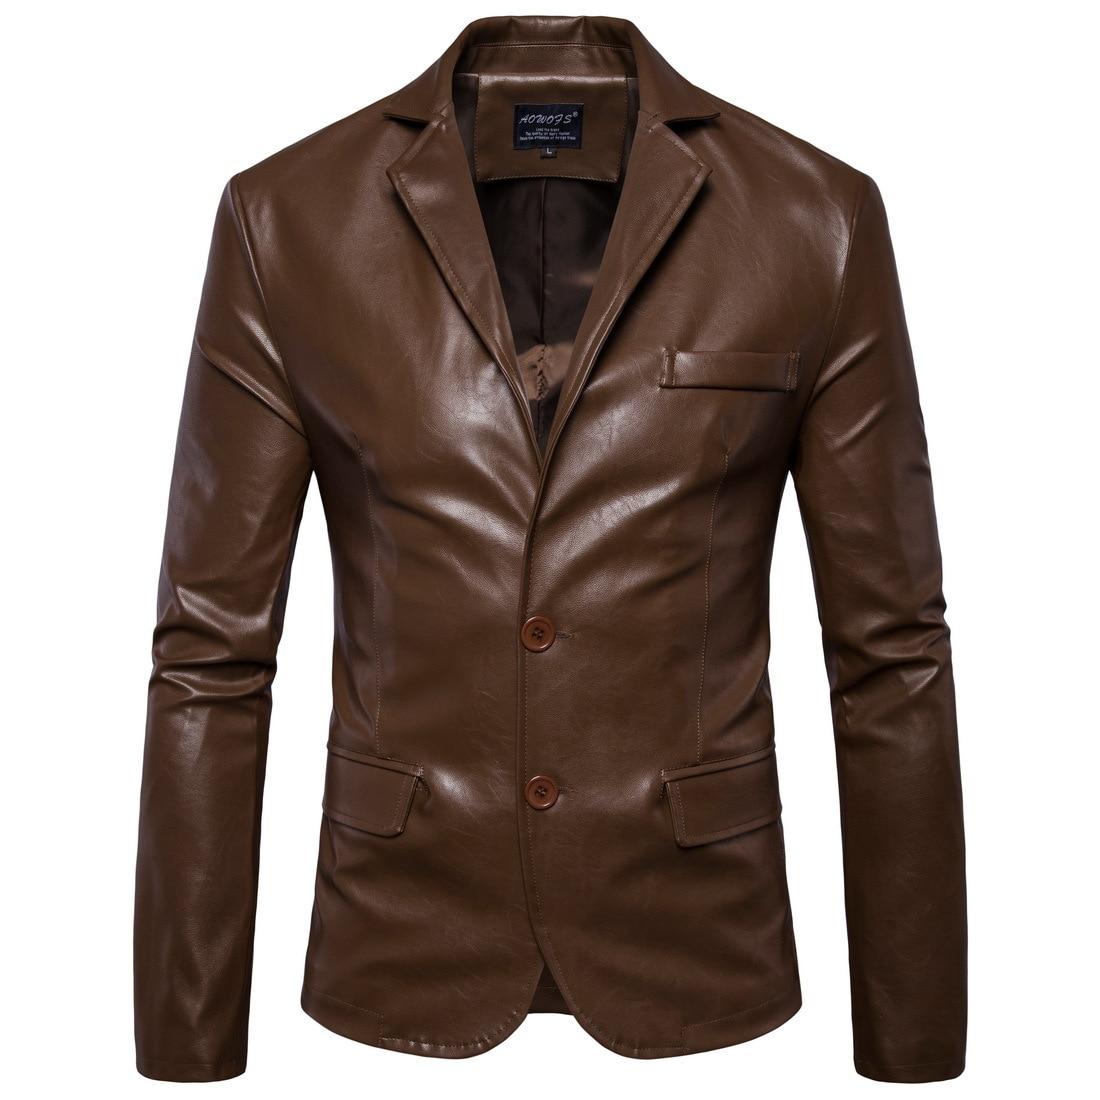 Men Leather Coat Autumn And Winter New Men's Leathers British Trade  Simple Suit Jacket  Men